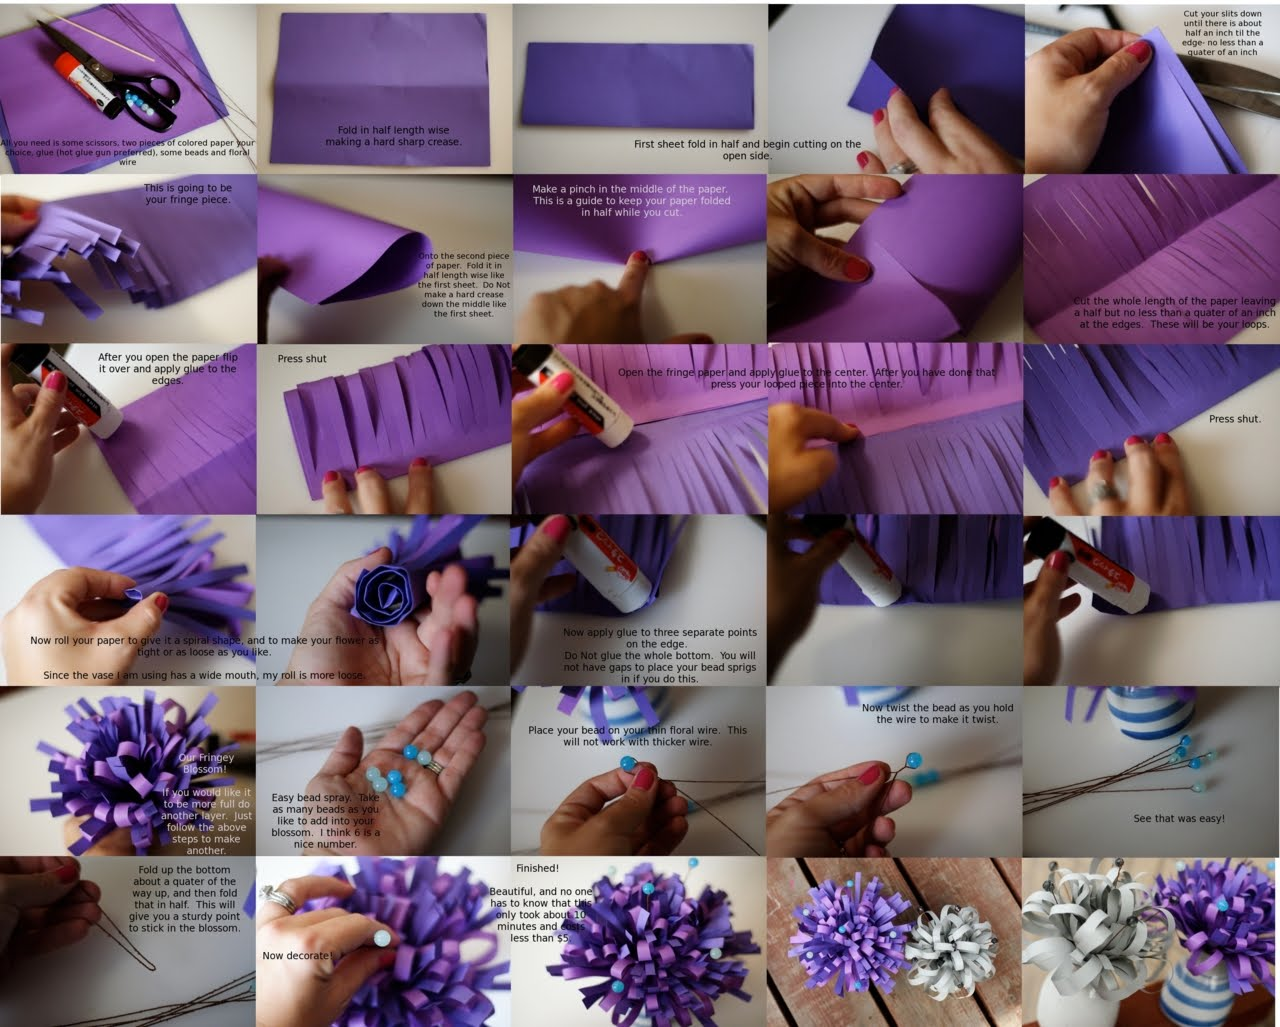 Pocket wonders diy paper flower centerpieces diy paper flower centerpieces mightylinksfo